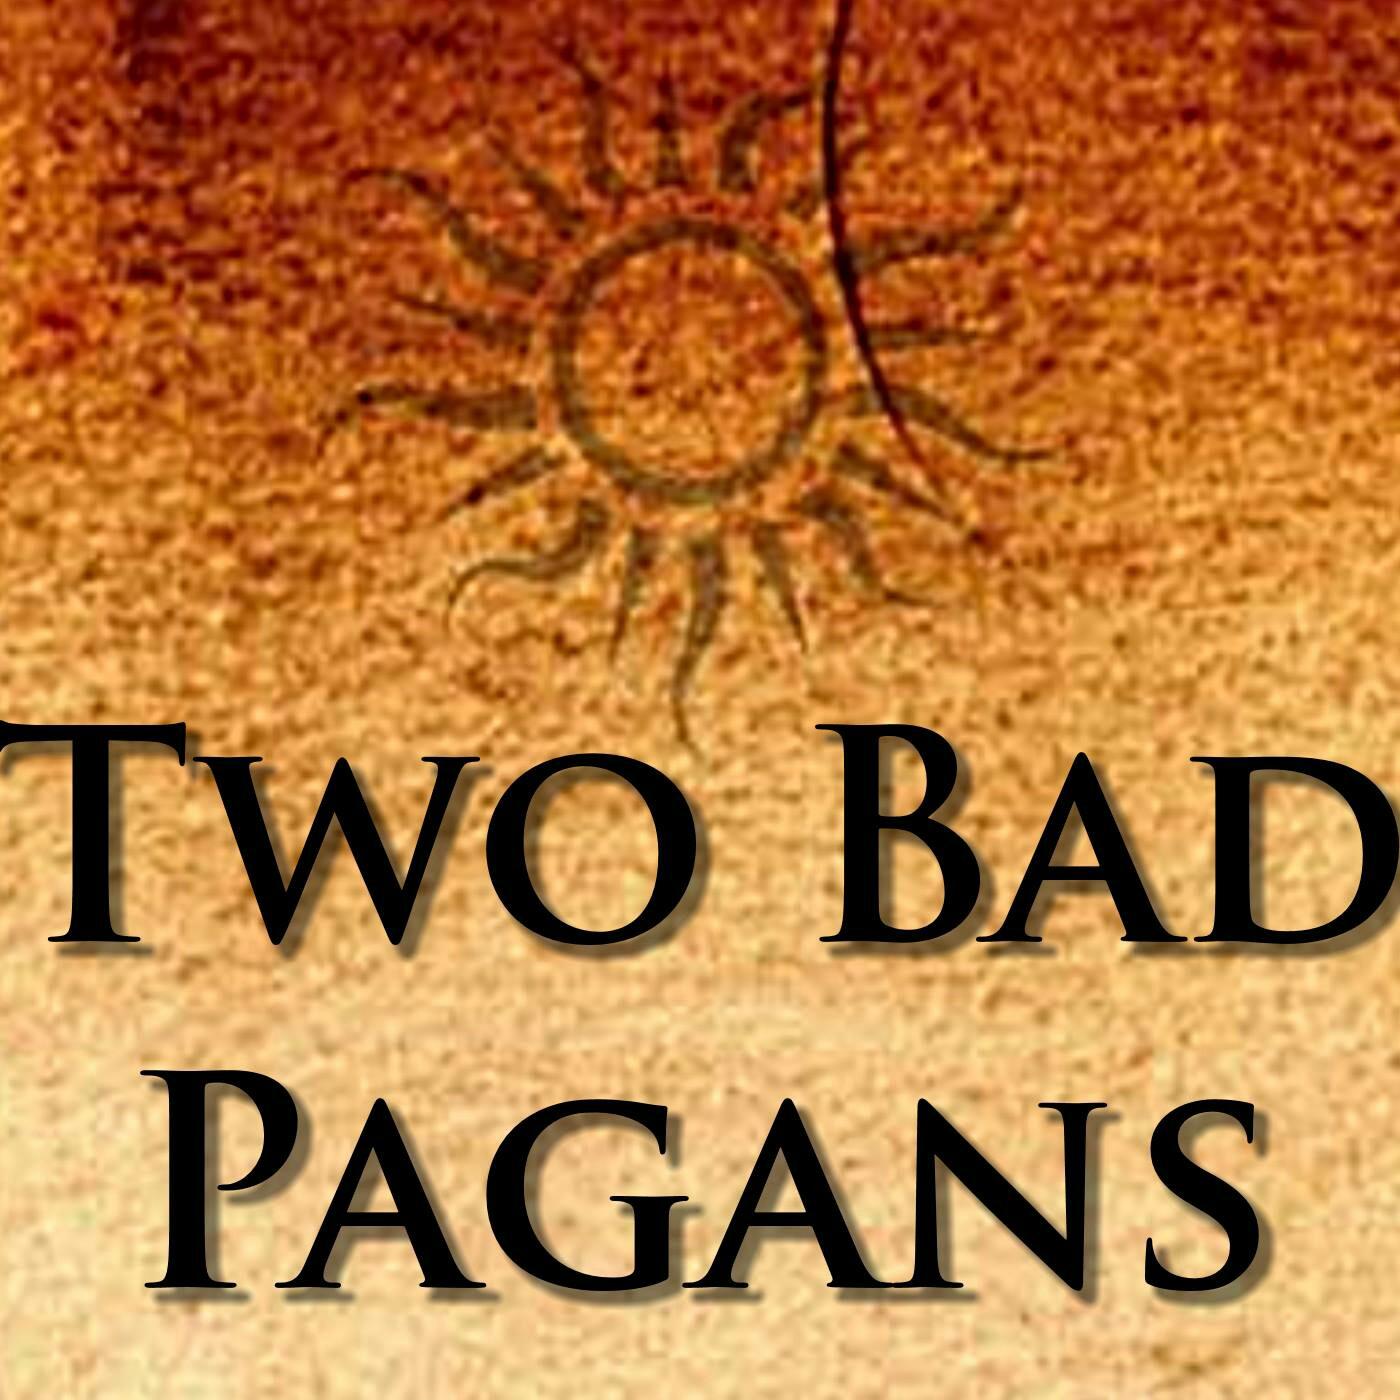 Two Bad Pagans